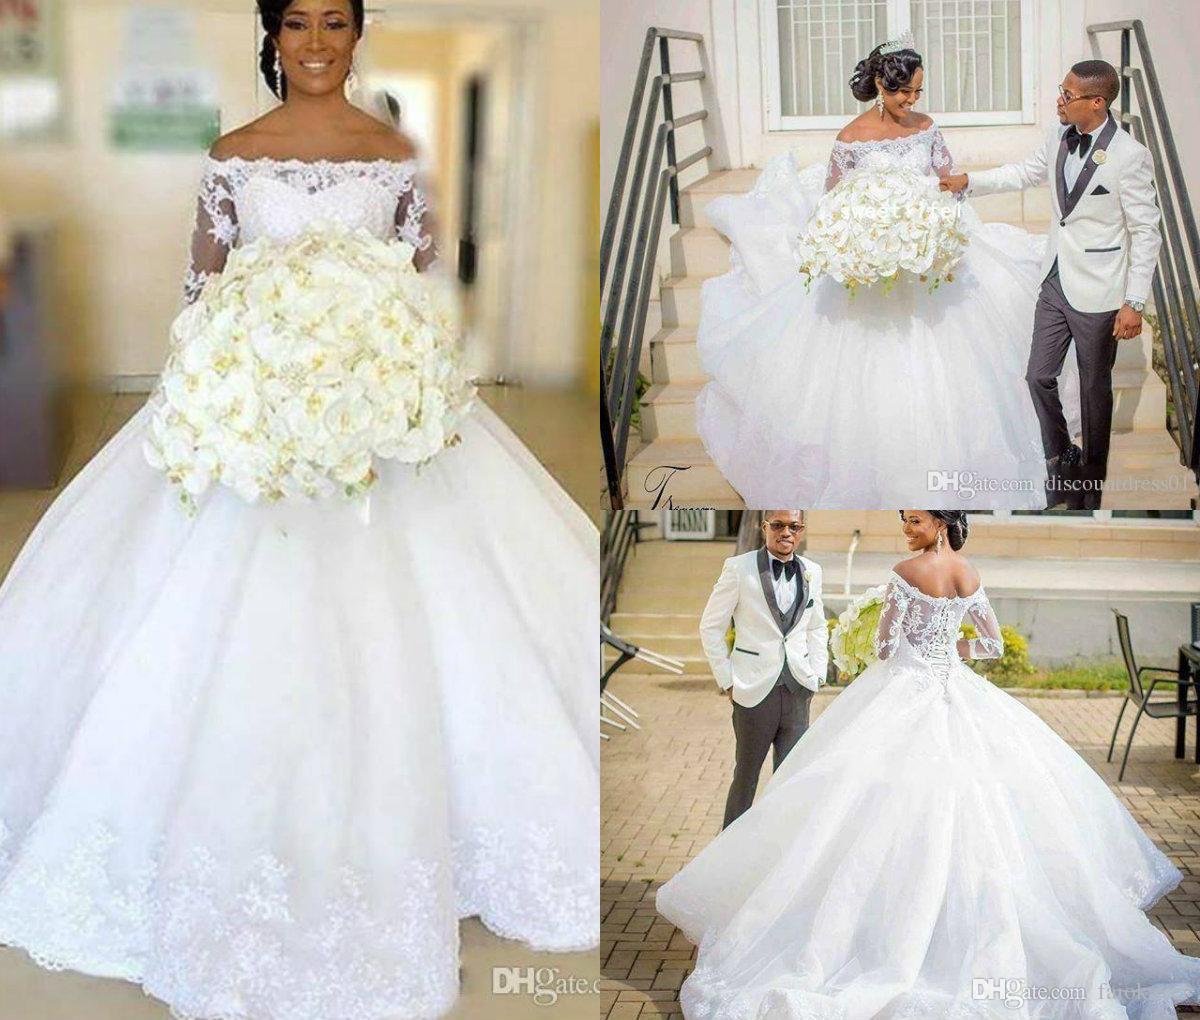 Top Plus Size Wedding Dress Designers - raveitsafe